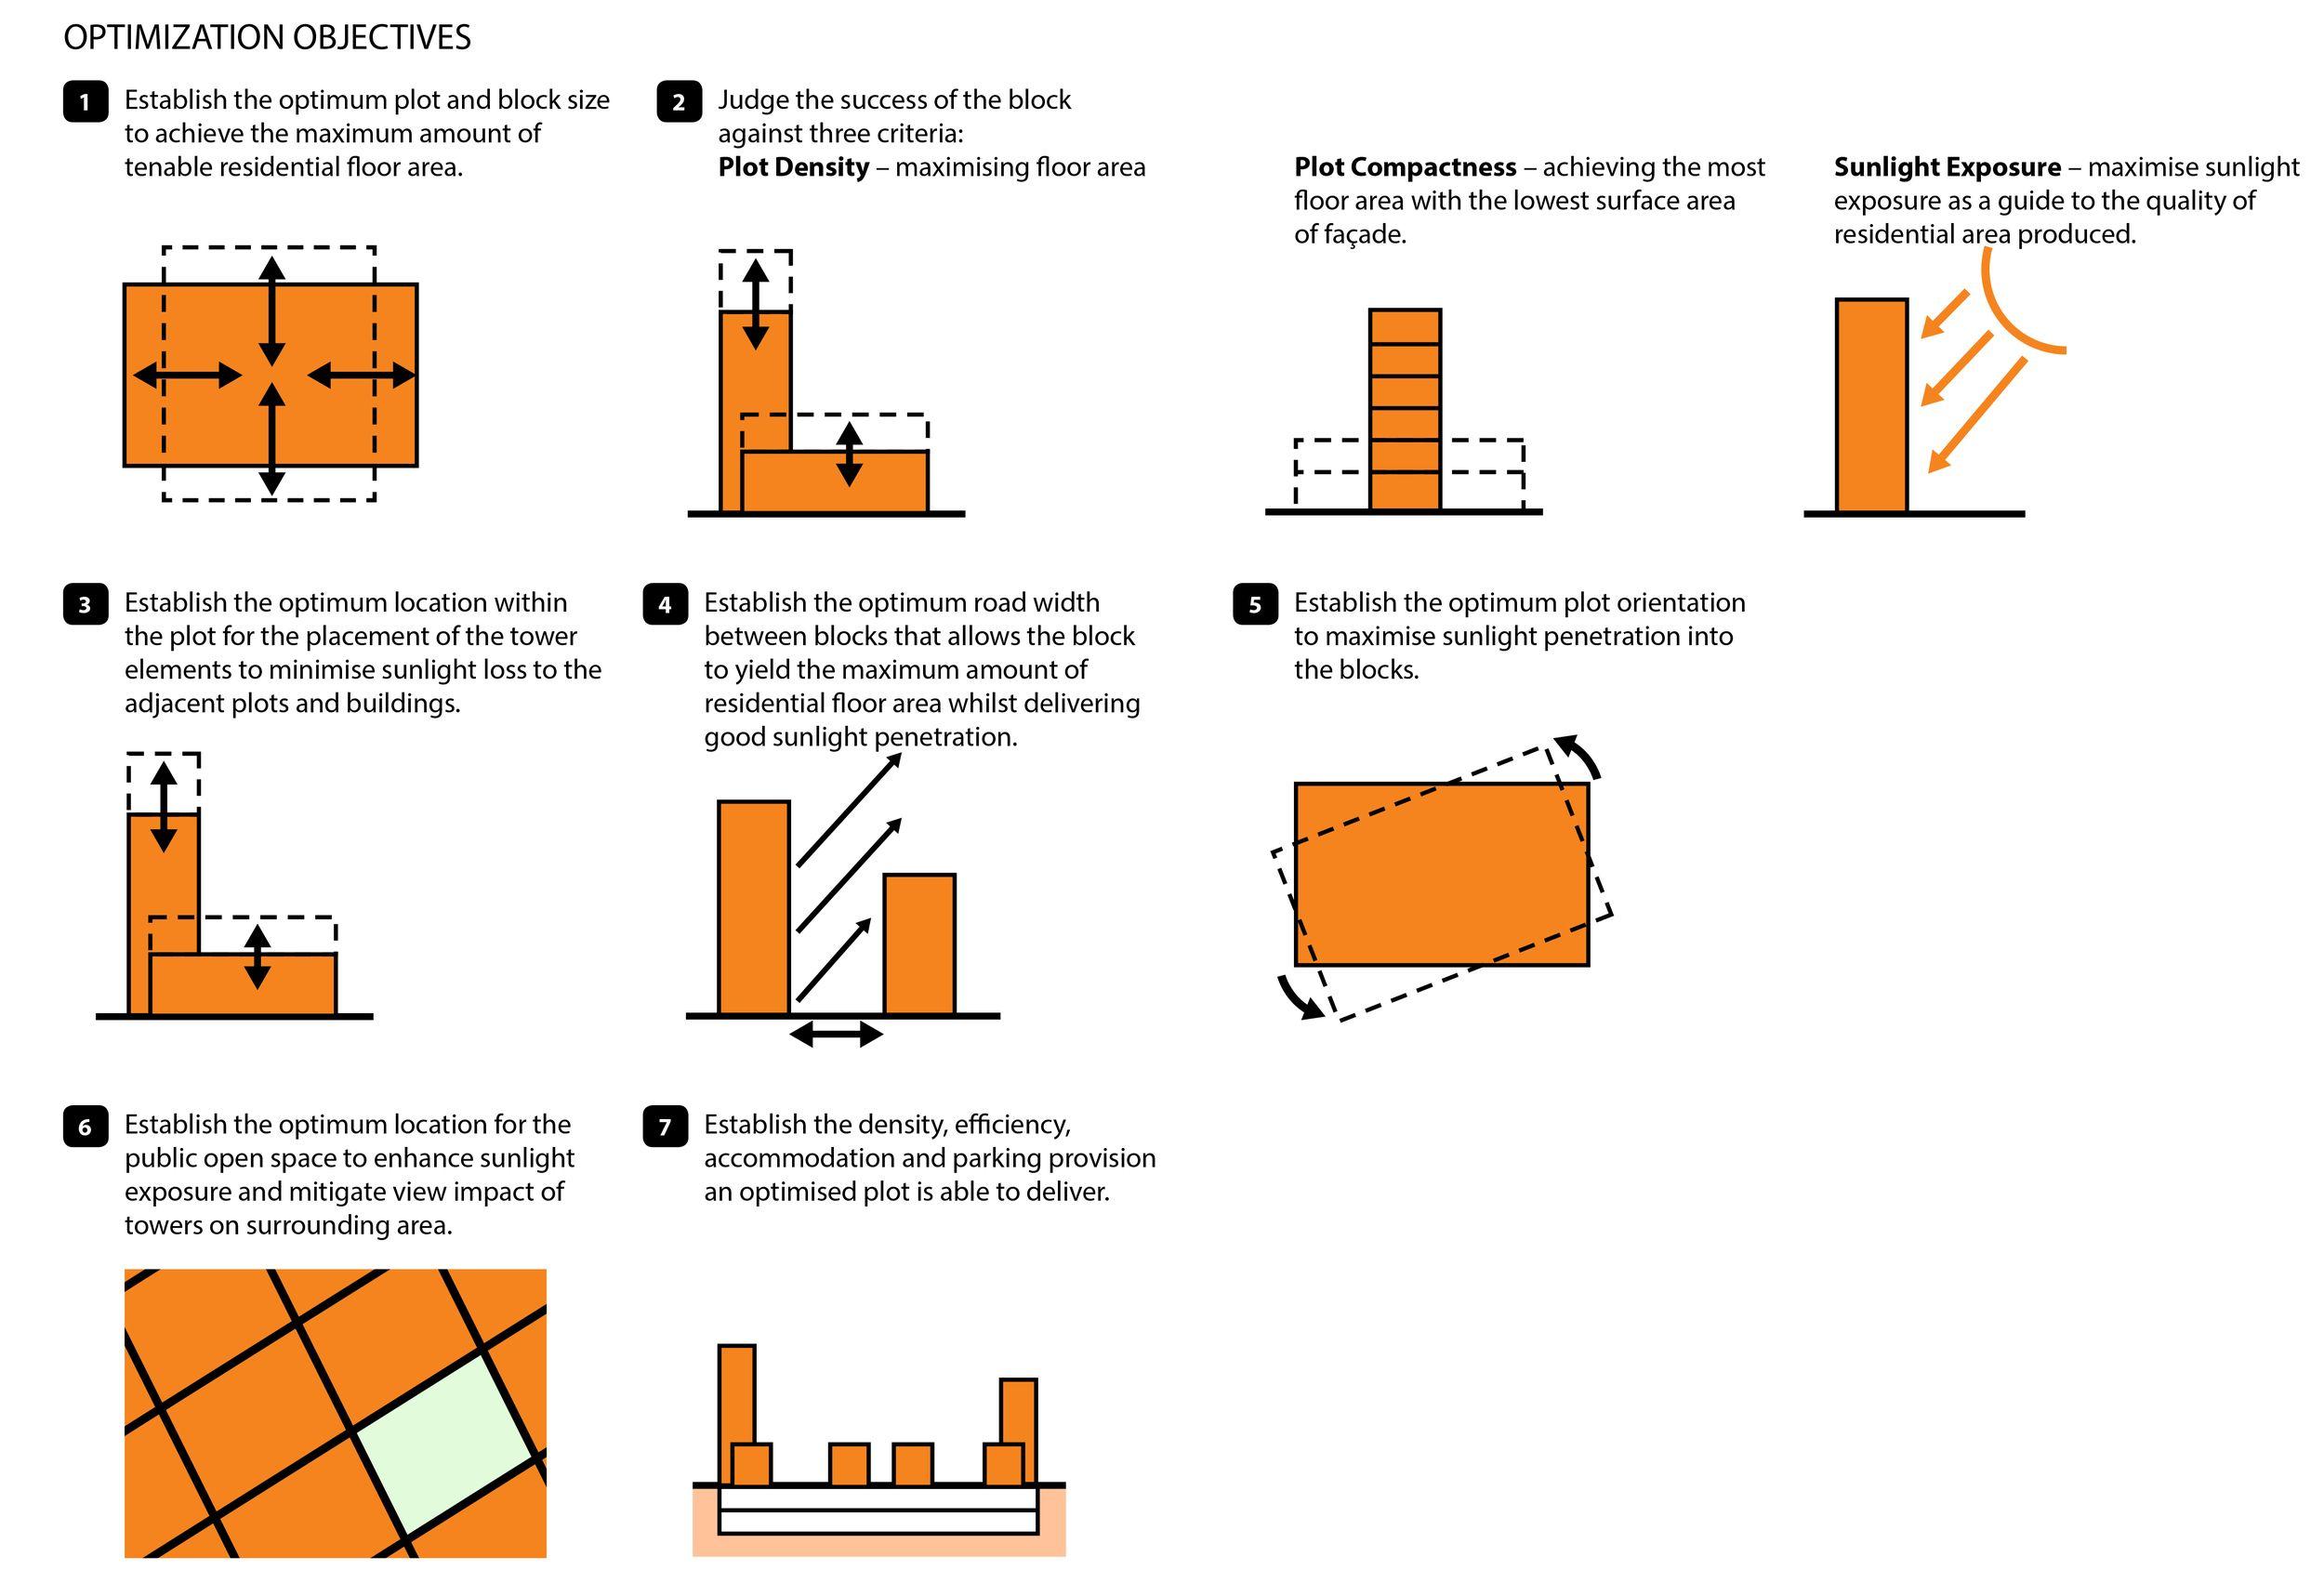 Performance Criteria How To Plan Design Strategy Optimization